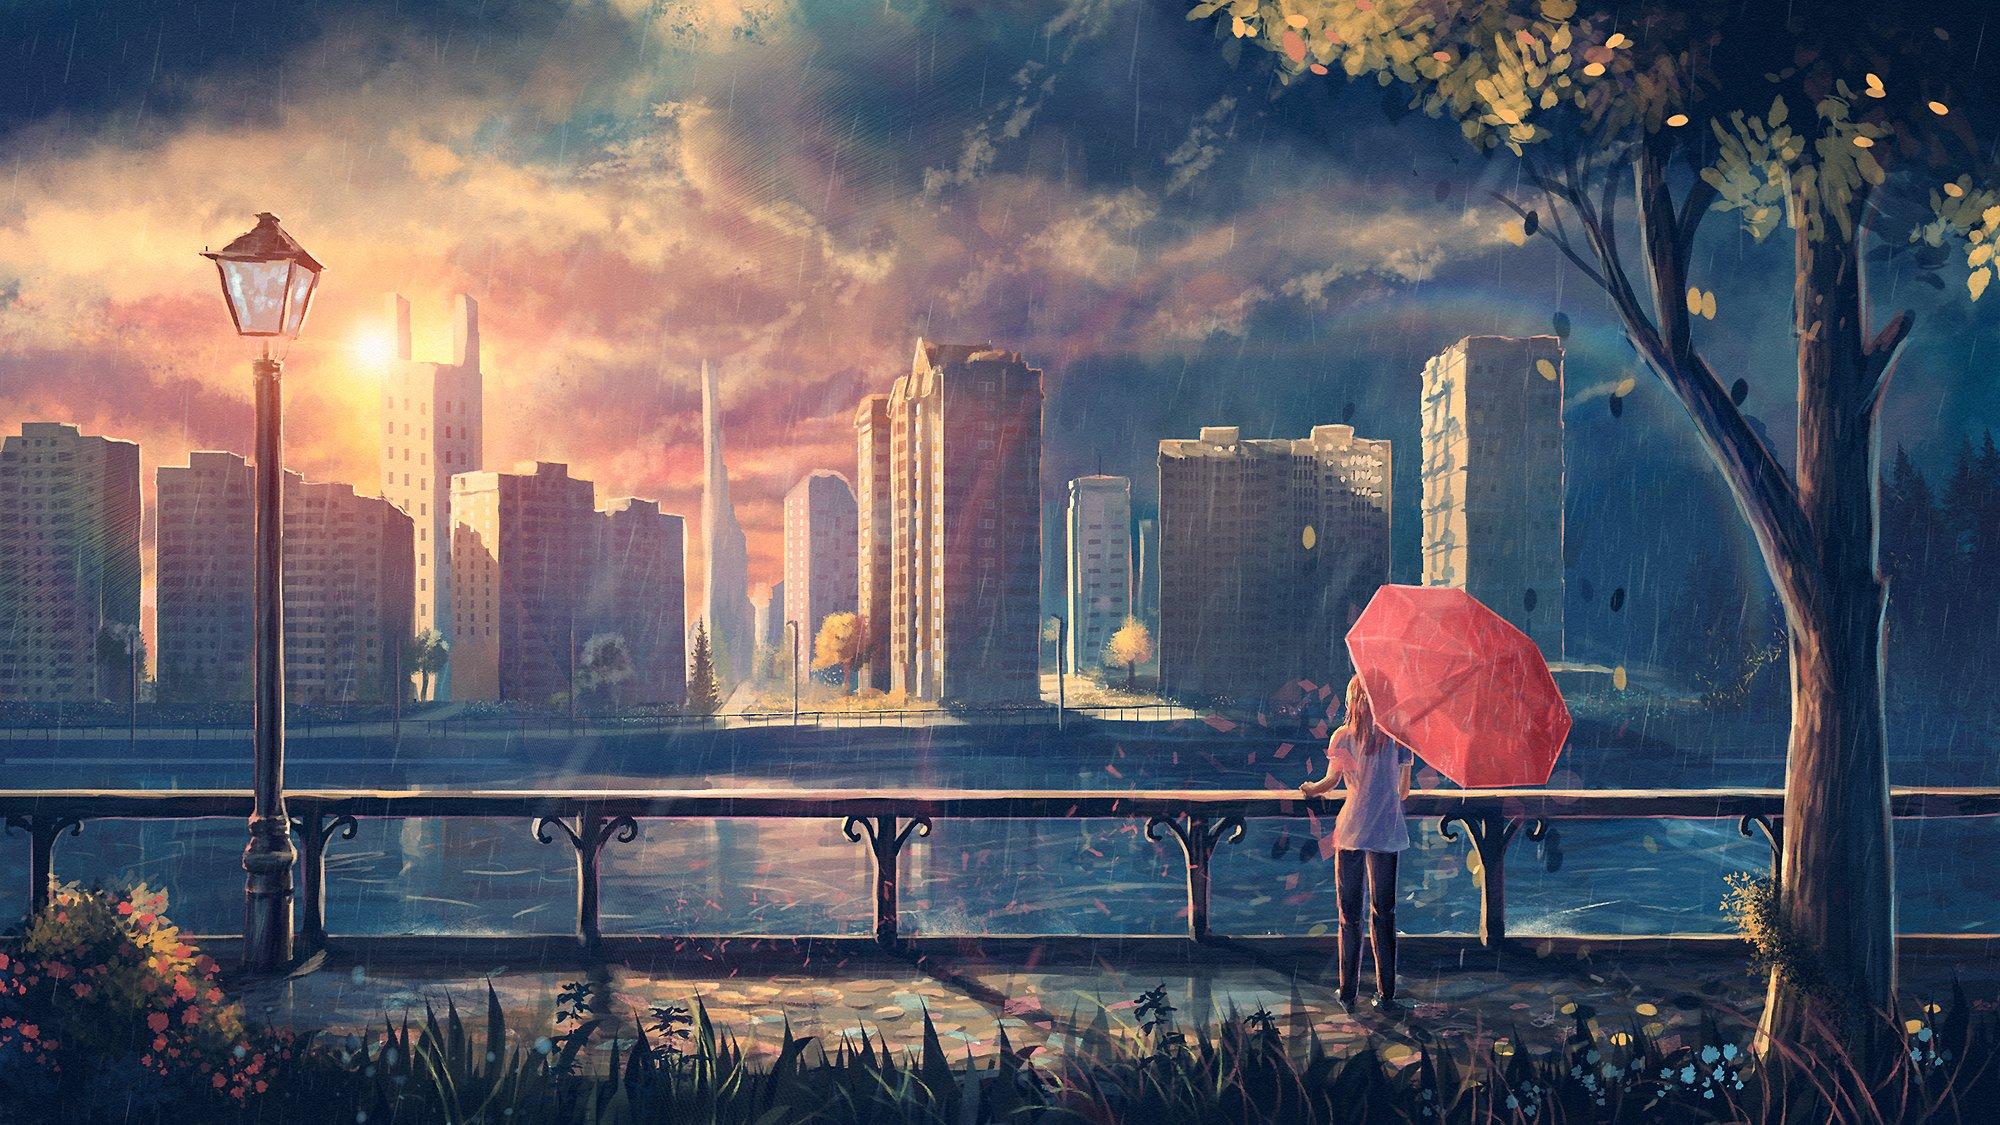 rain city wallpaper - photo #7